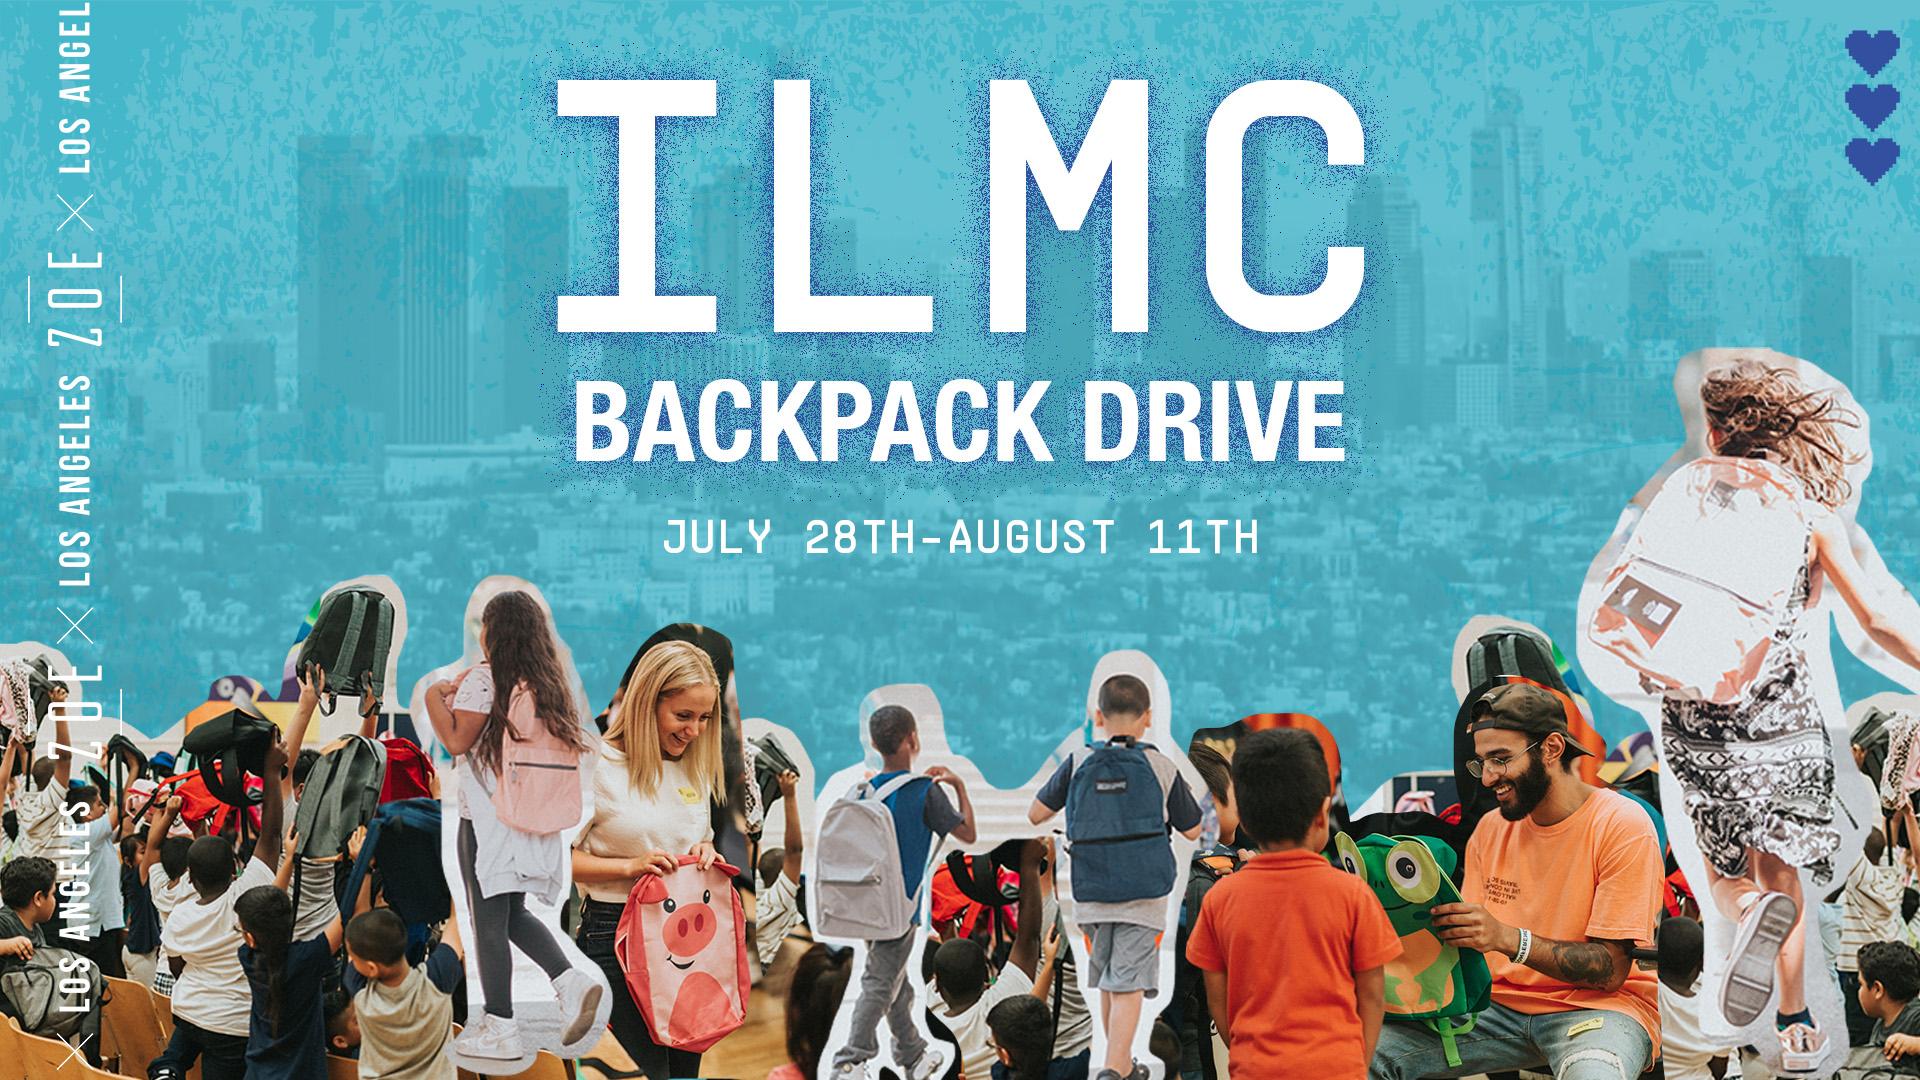 ILMC Backpack Drive.jpg